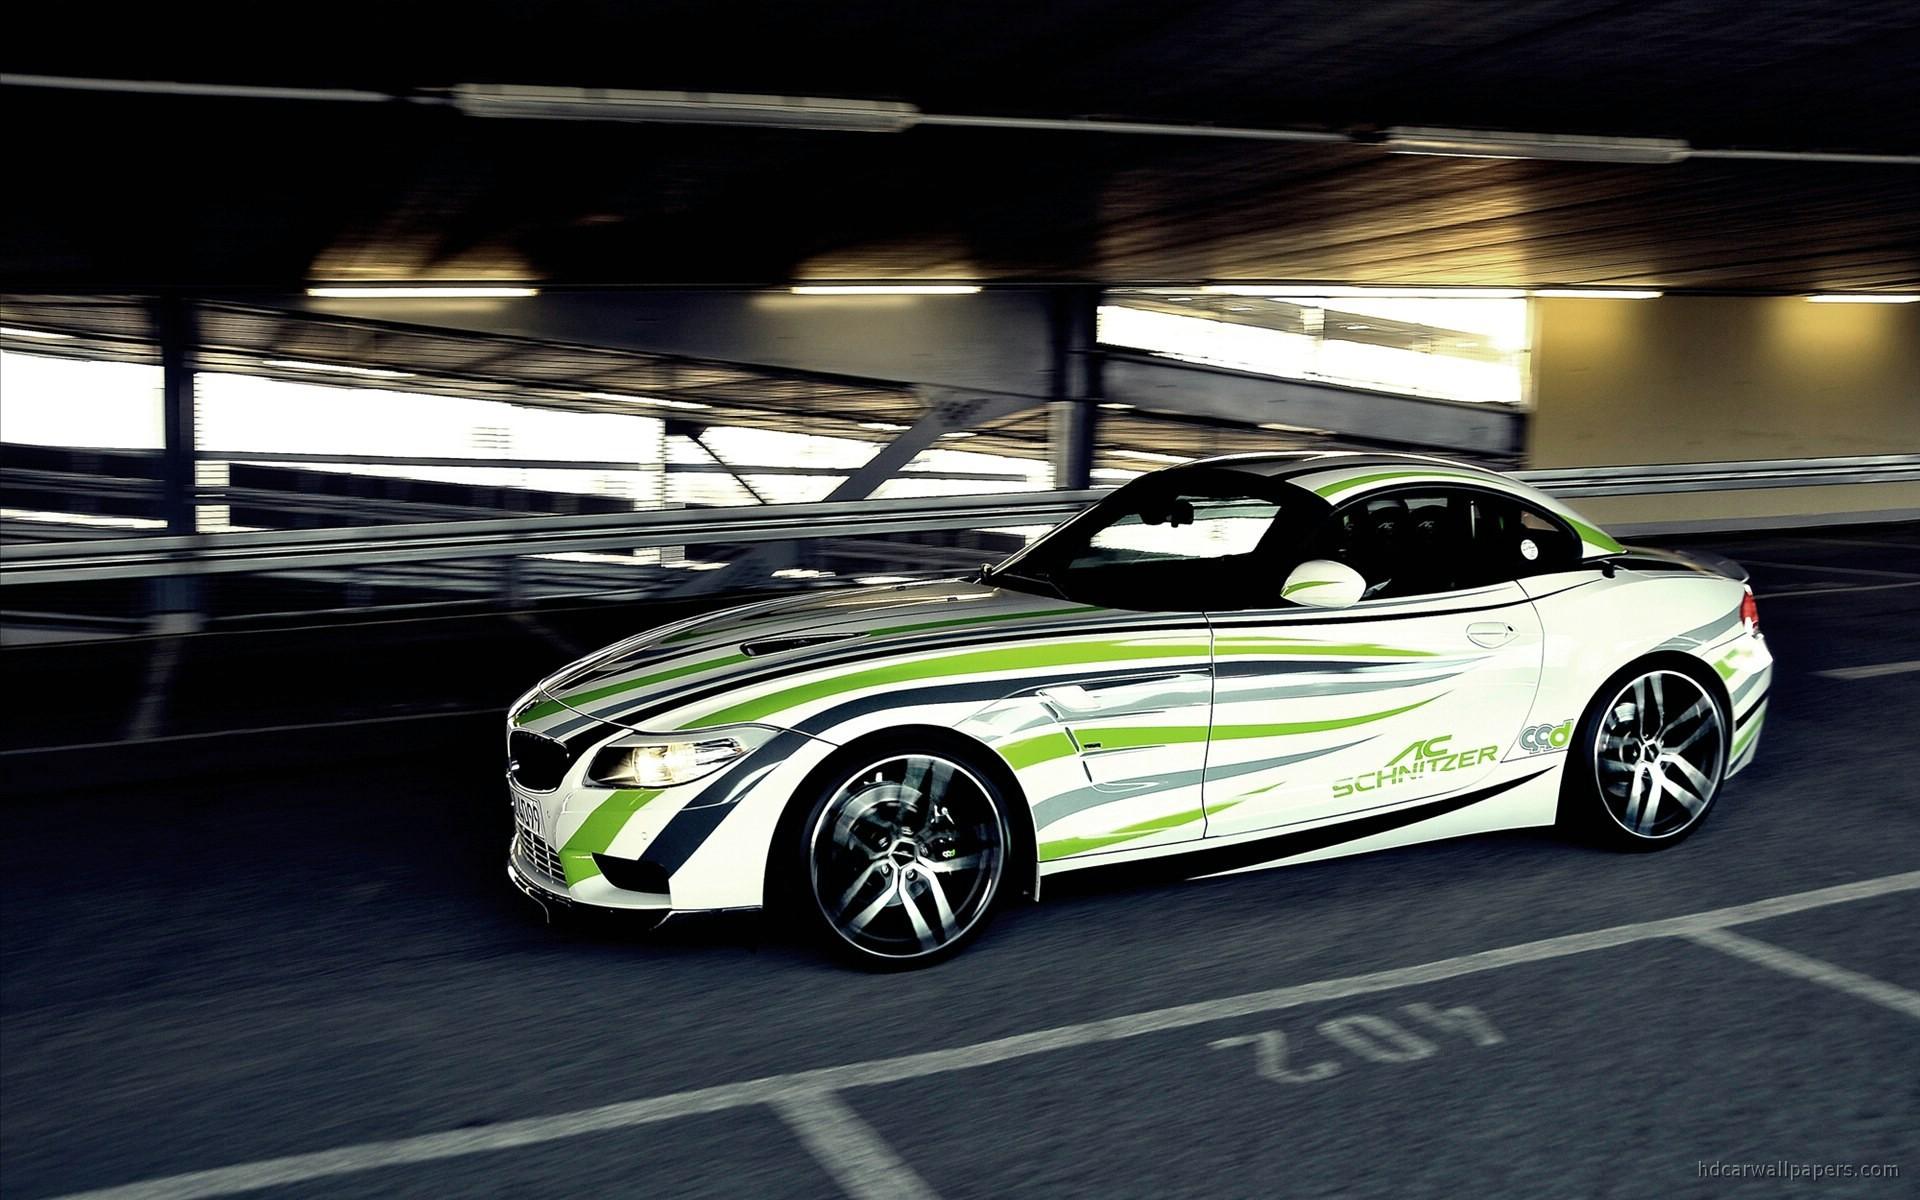 2011 bmw concept car 2 wallpaper hd car wallpapers id - Future cars hd wallpapers ...